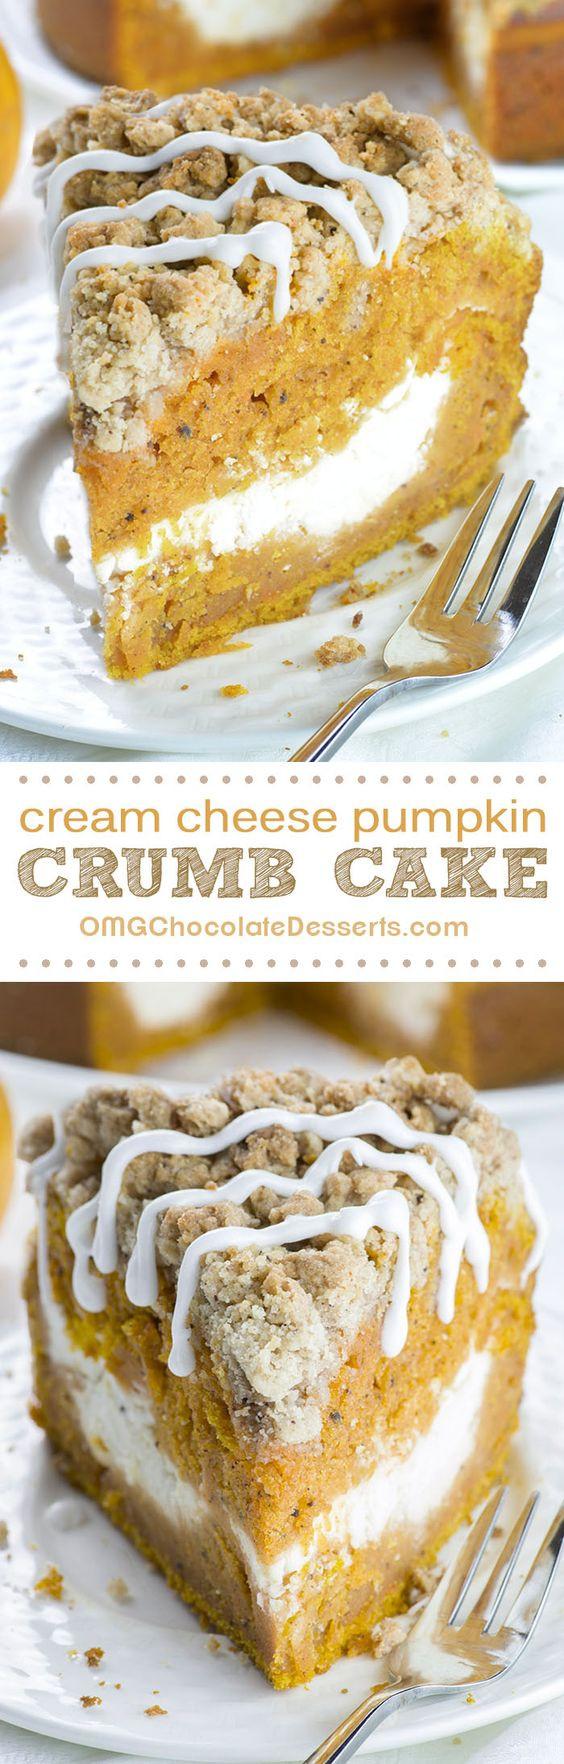 Fall Cake Recipes  Pumpkin coffee cakes Coffee cake and Fall recipes on